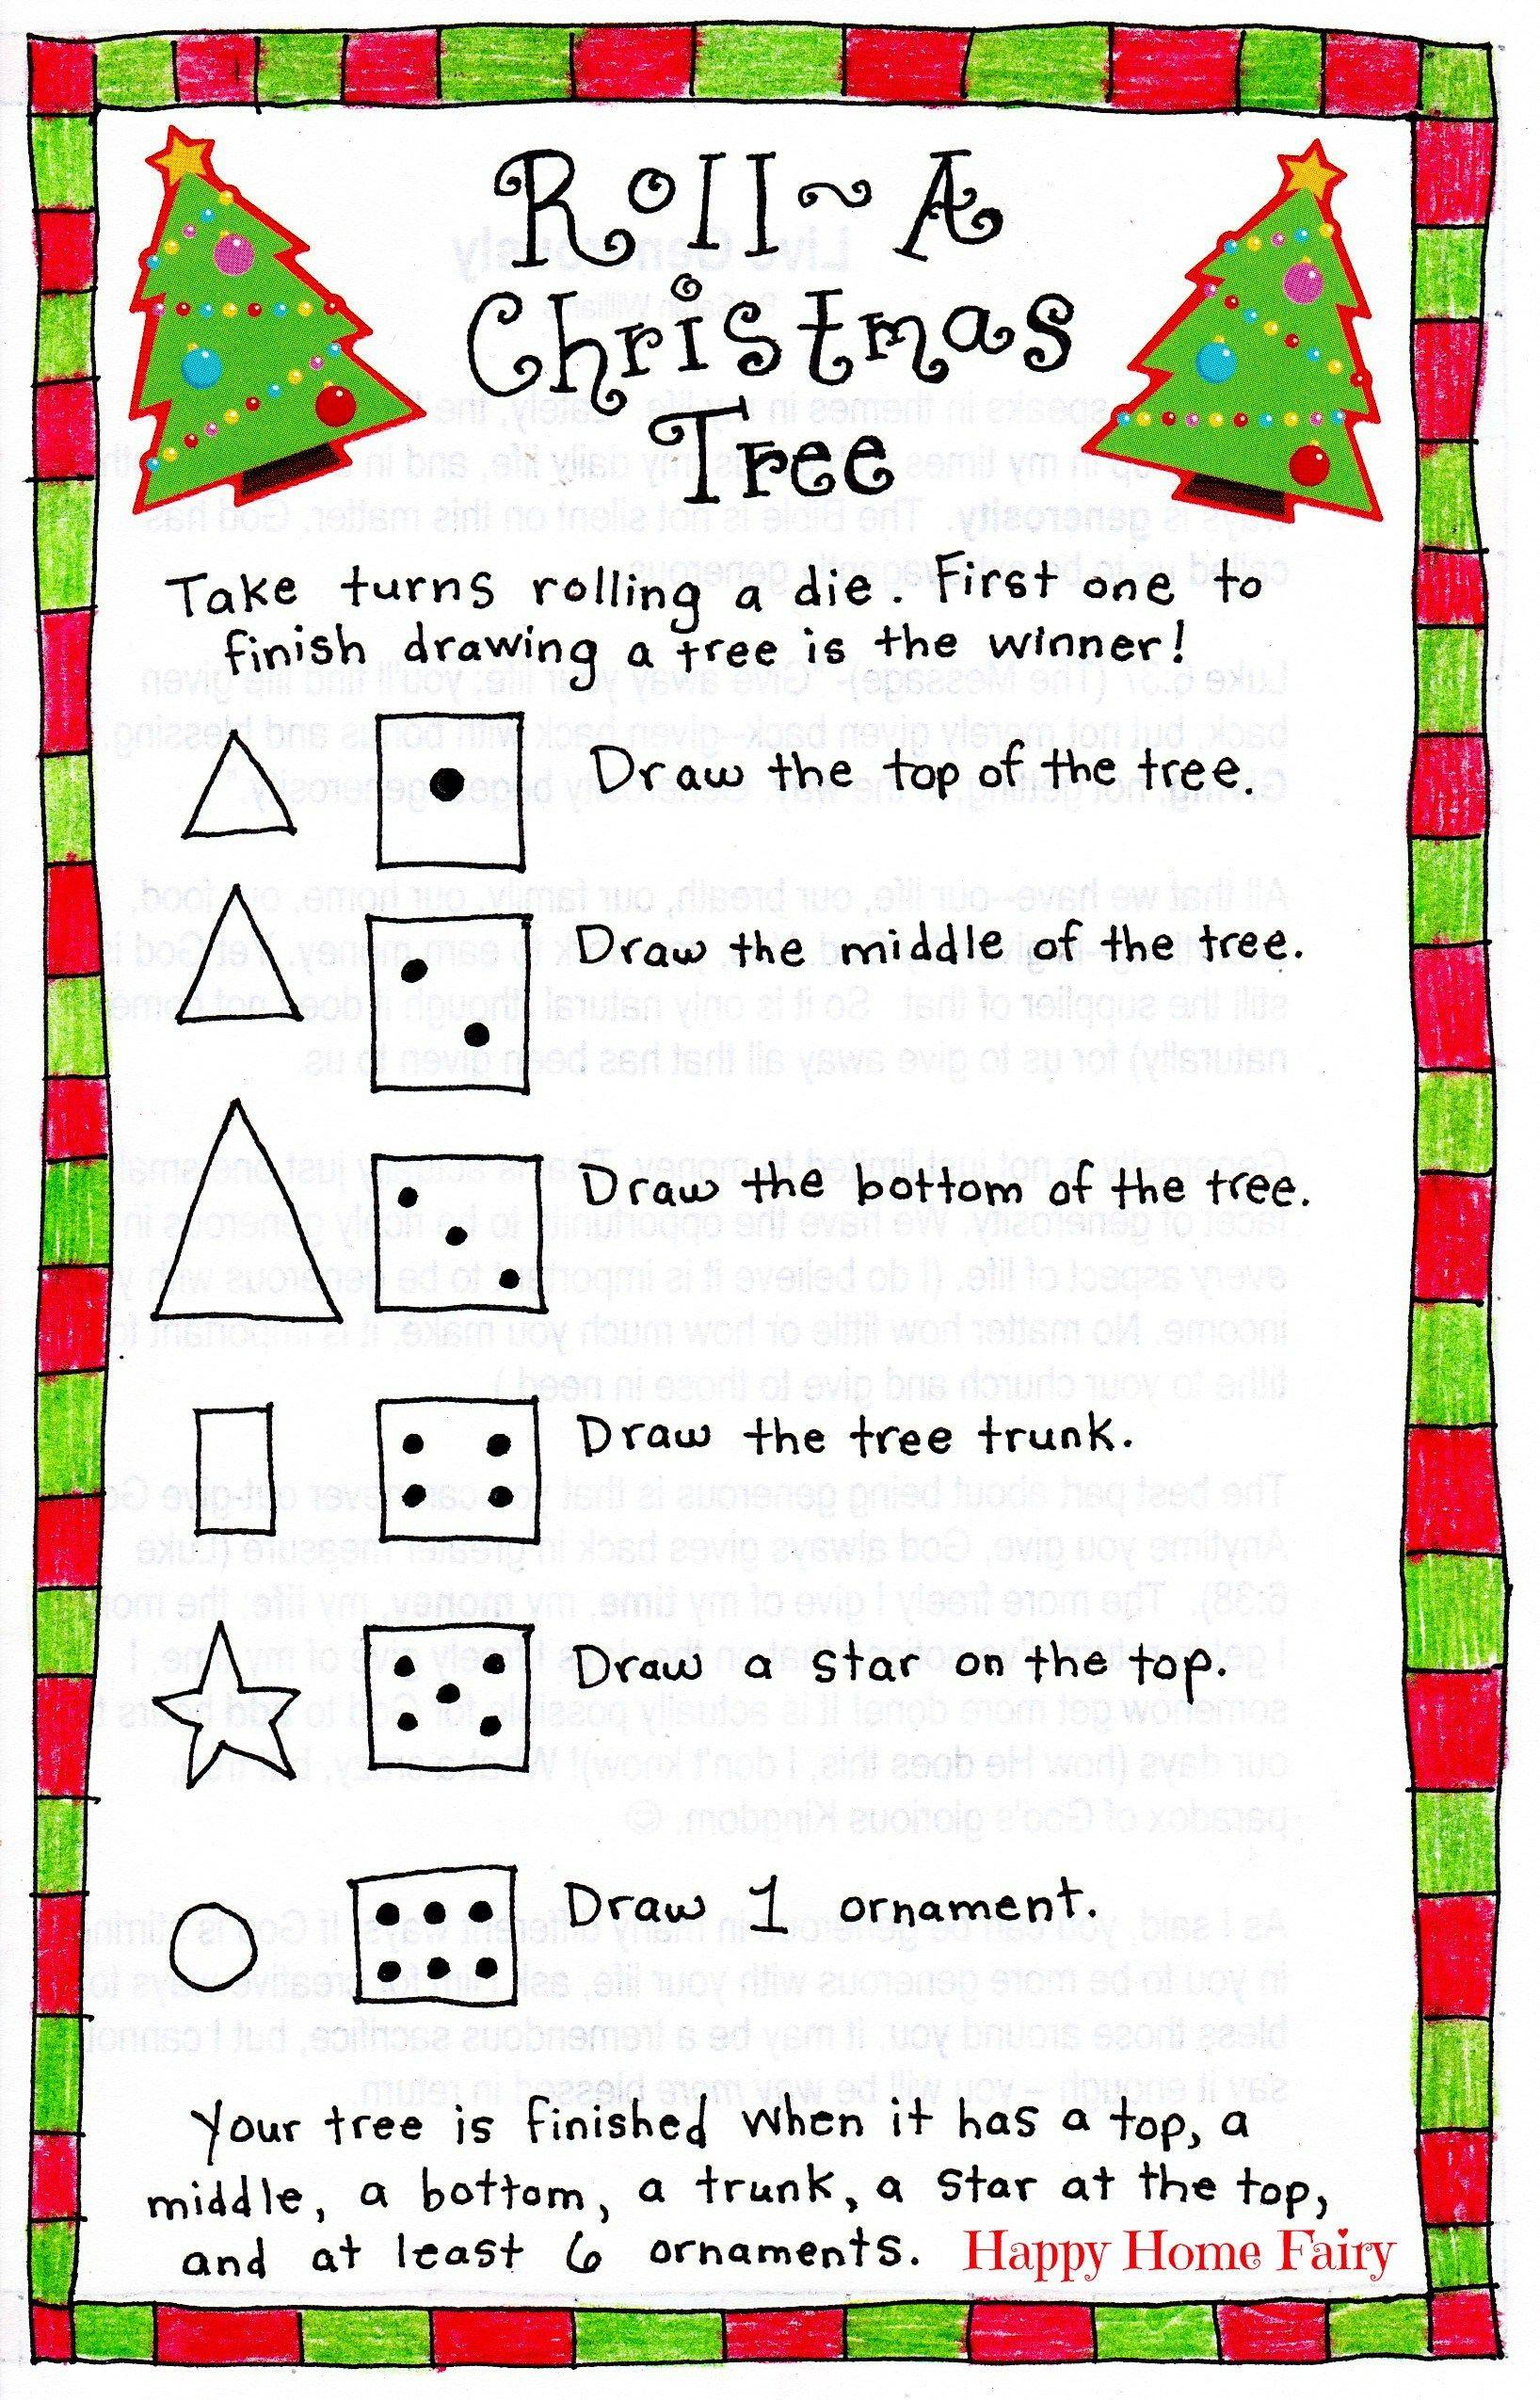 Roll-A-Christmas-Tree Game – Free Printable! | Christmas | Pinterest - Free Printable Christmas Puzzles And Games